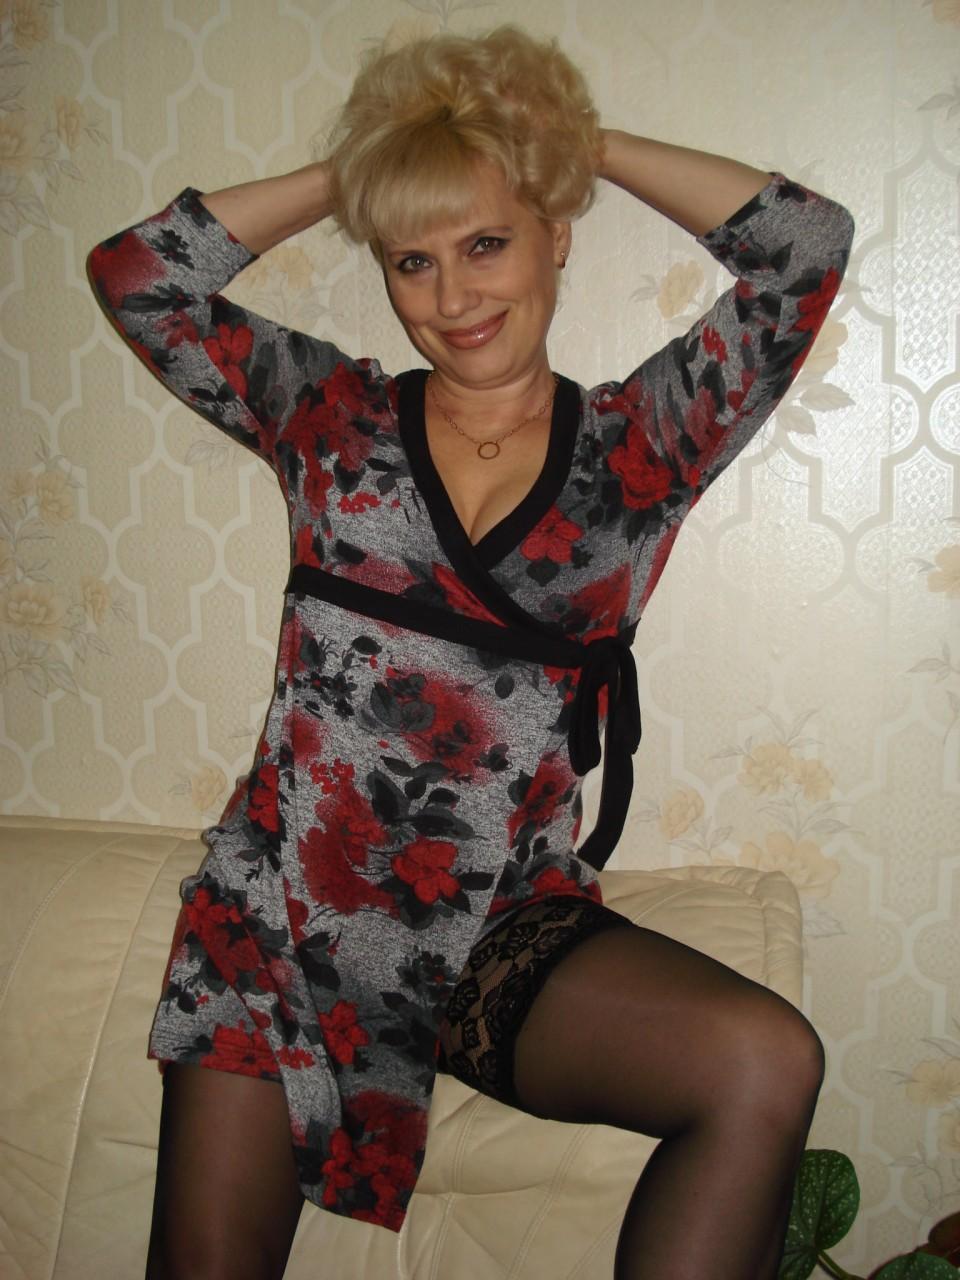 госпожа индивидуалка ищет раба в москве